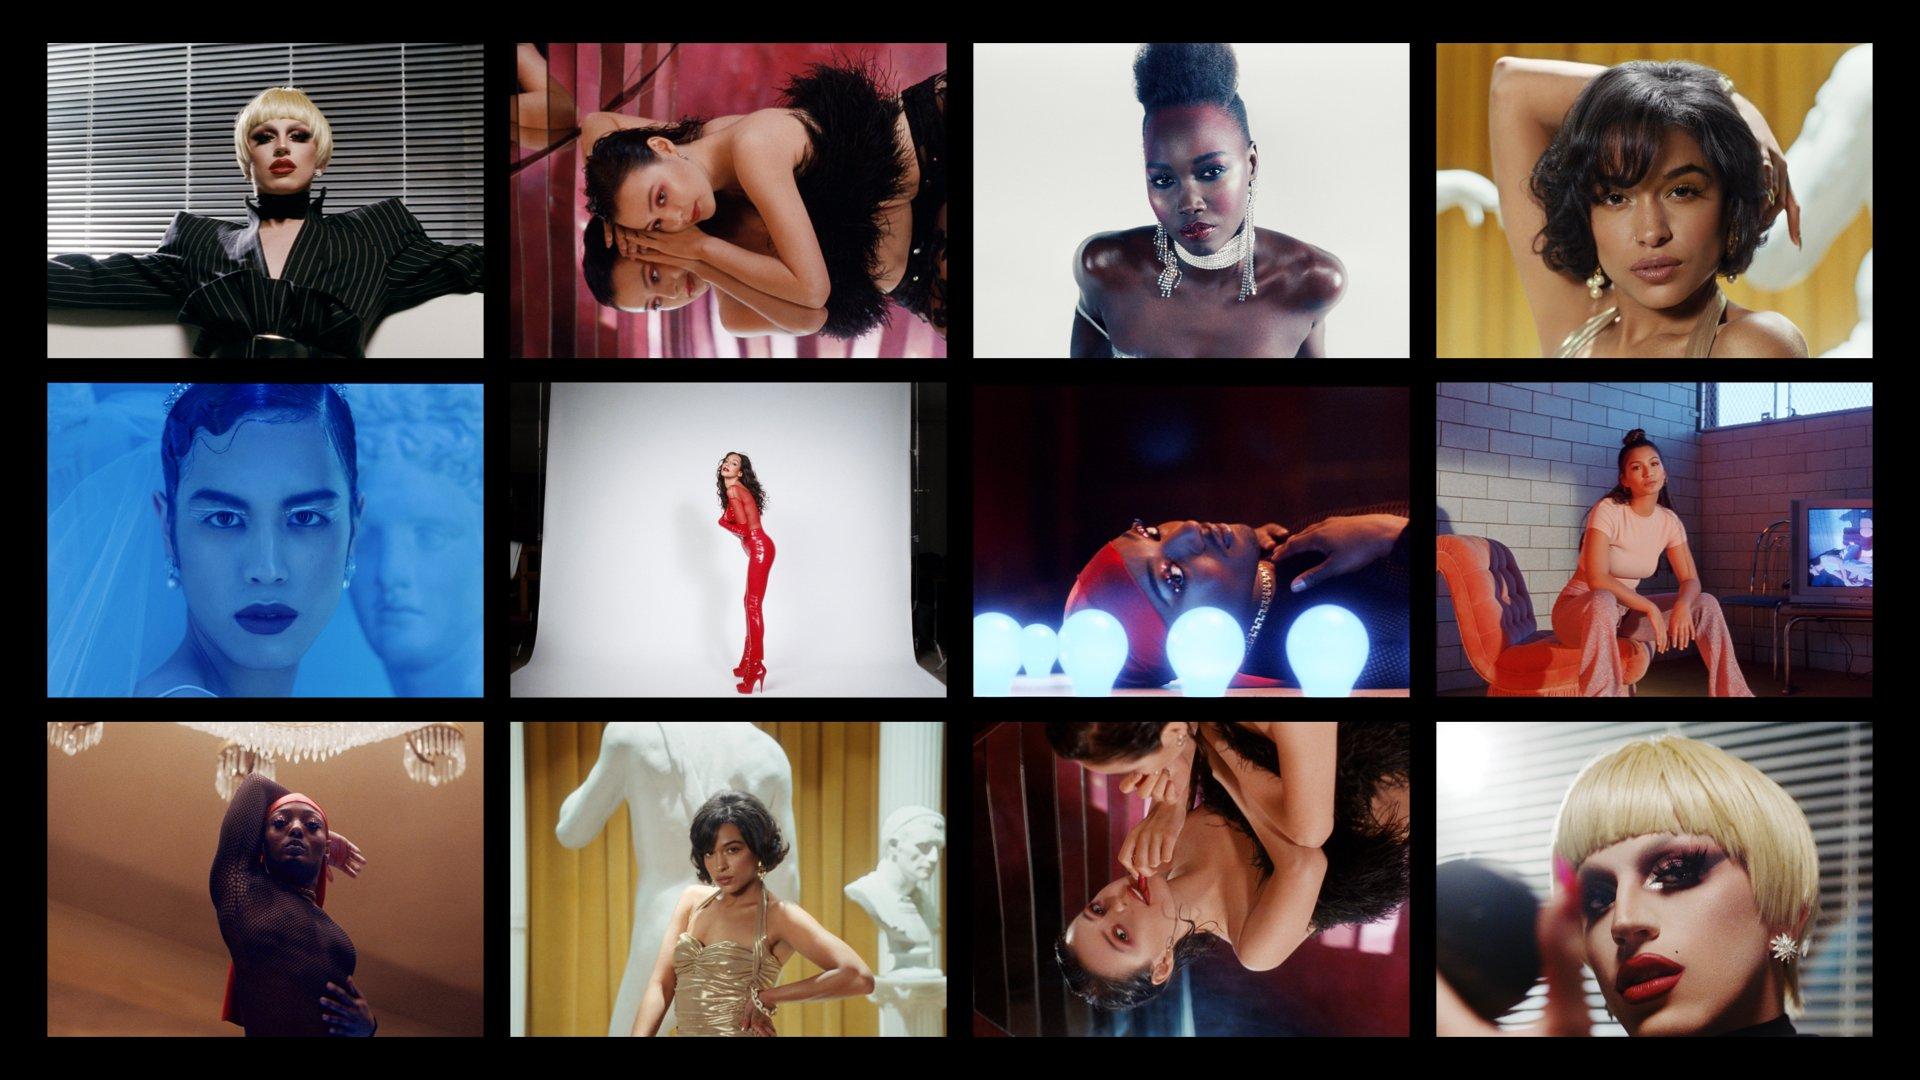 Stills from Mac Viva Glam 25th anniversary campaign, concept and design by RoAndCo Studio